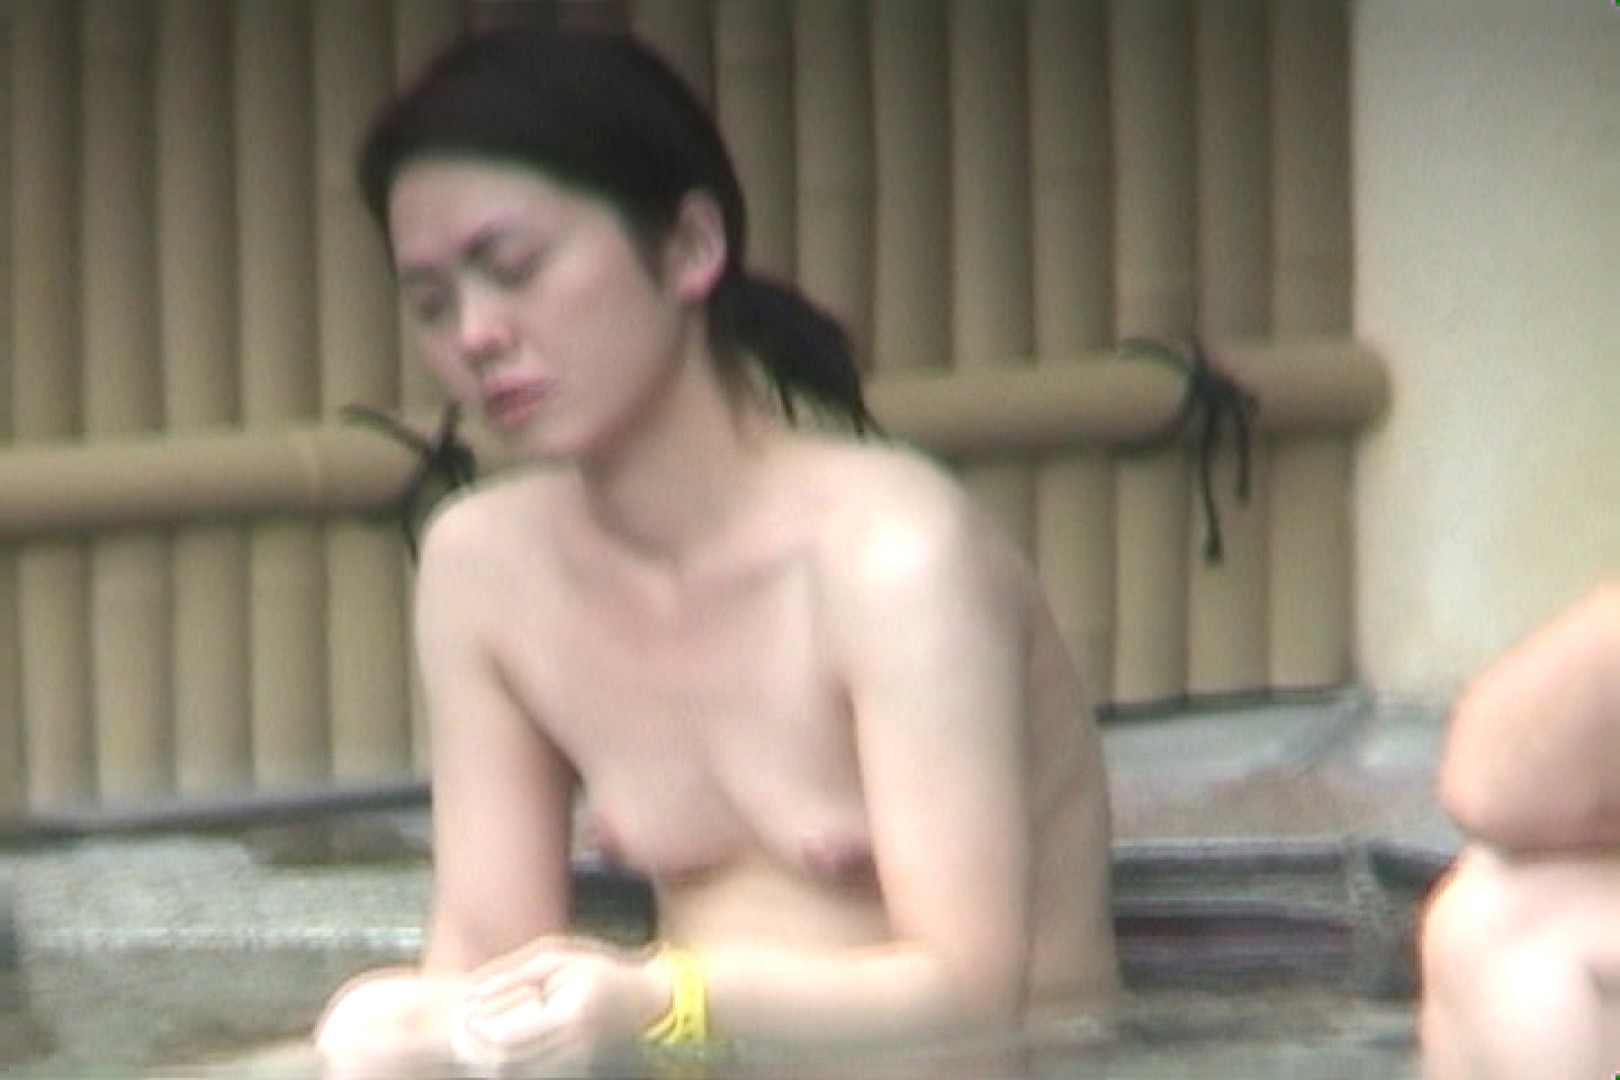 Aquaな露天風呂Vol.558 盗撮師作品  86pic 33